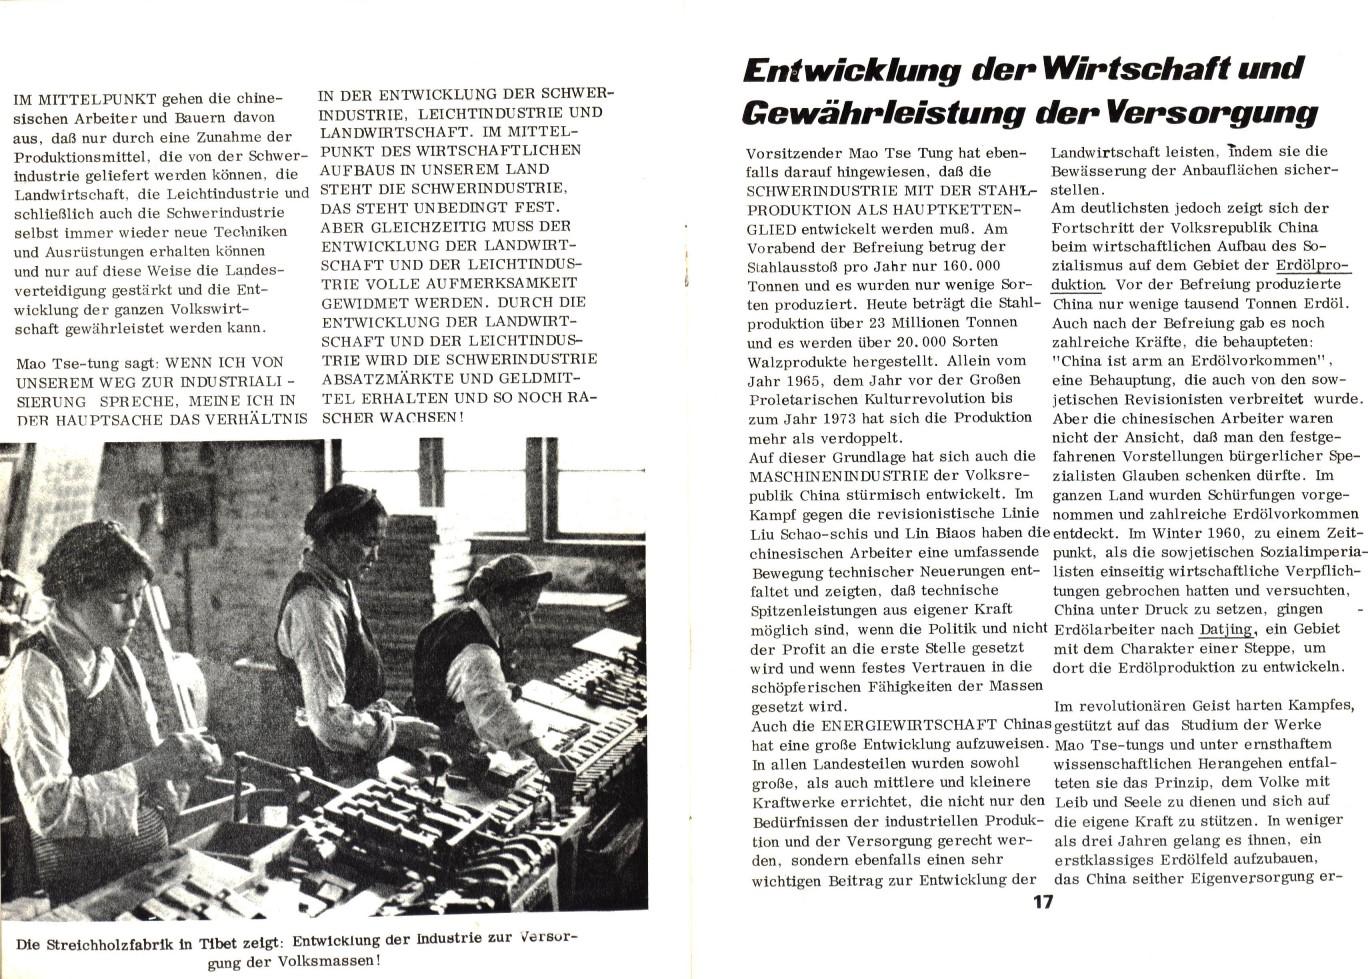 KPDAO_1975_Nationalausstellung_VRCh_in_Koeln_09